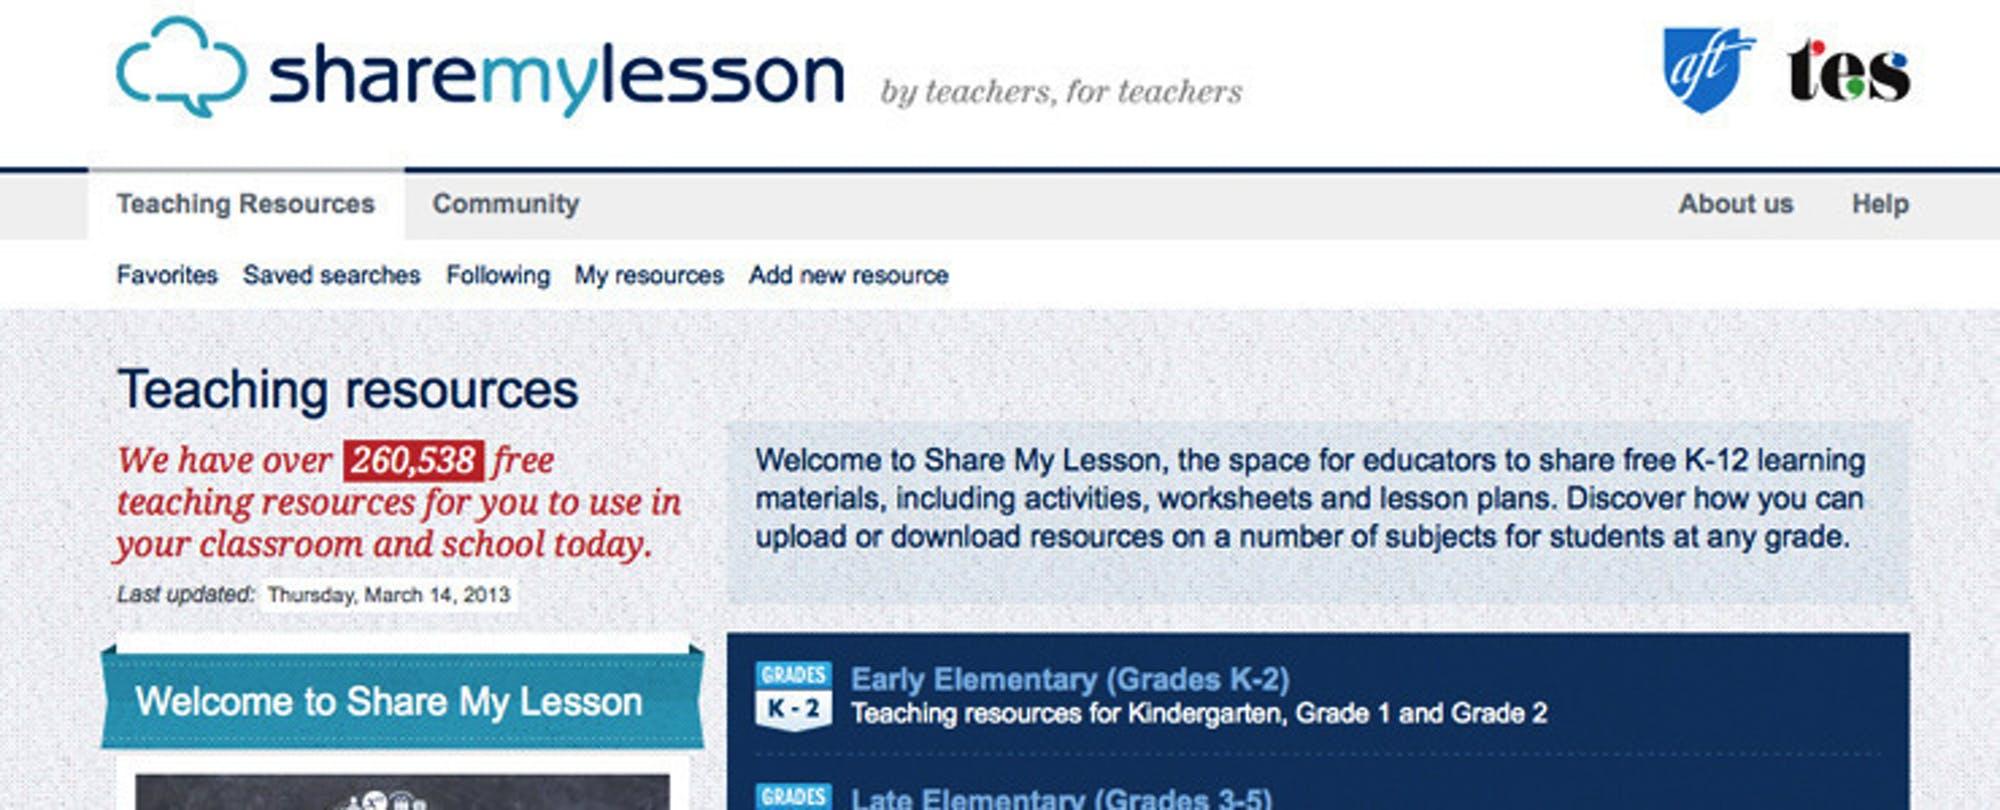 ShareMyLesson Provides Head Start for Common Core